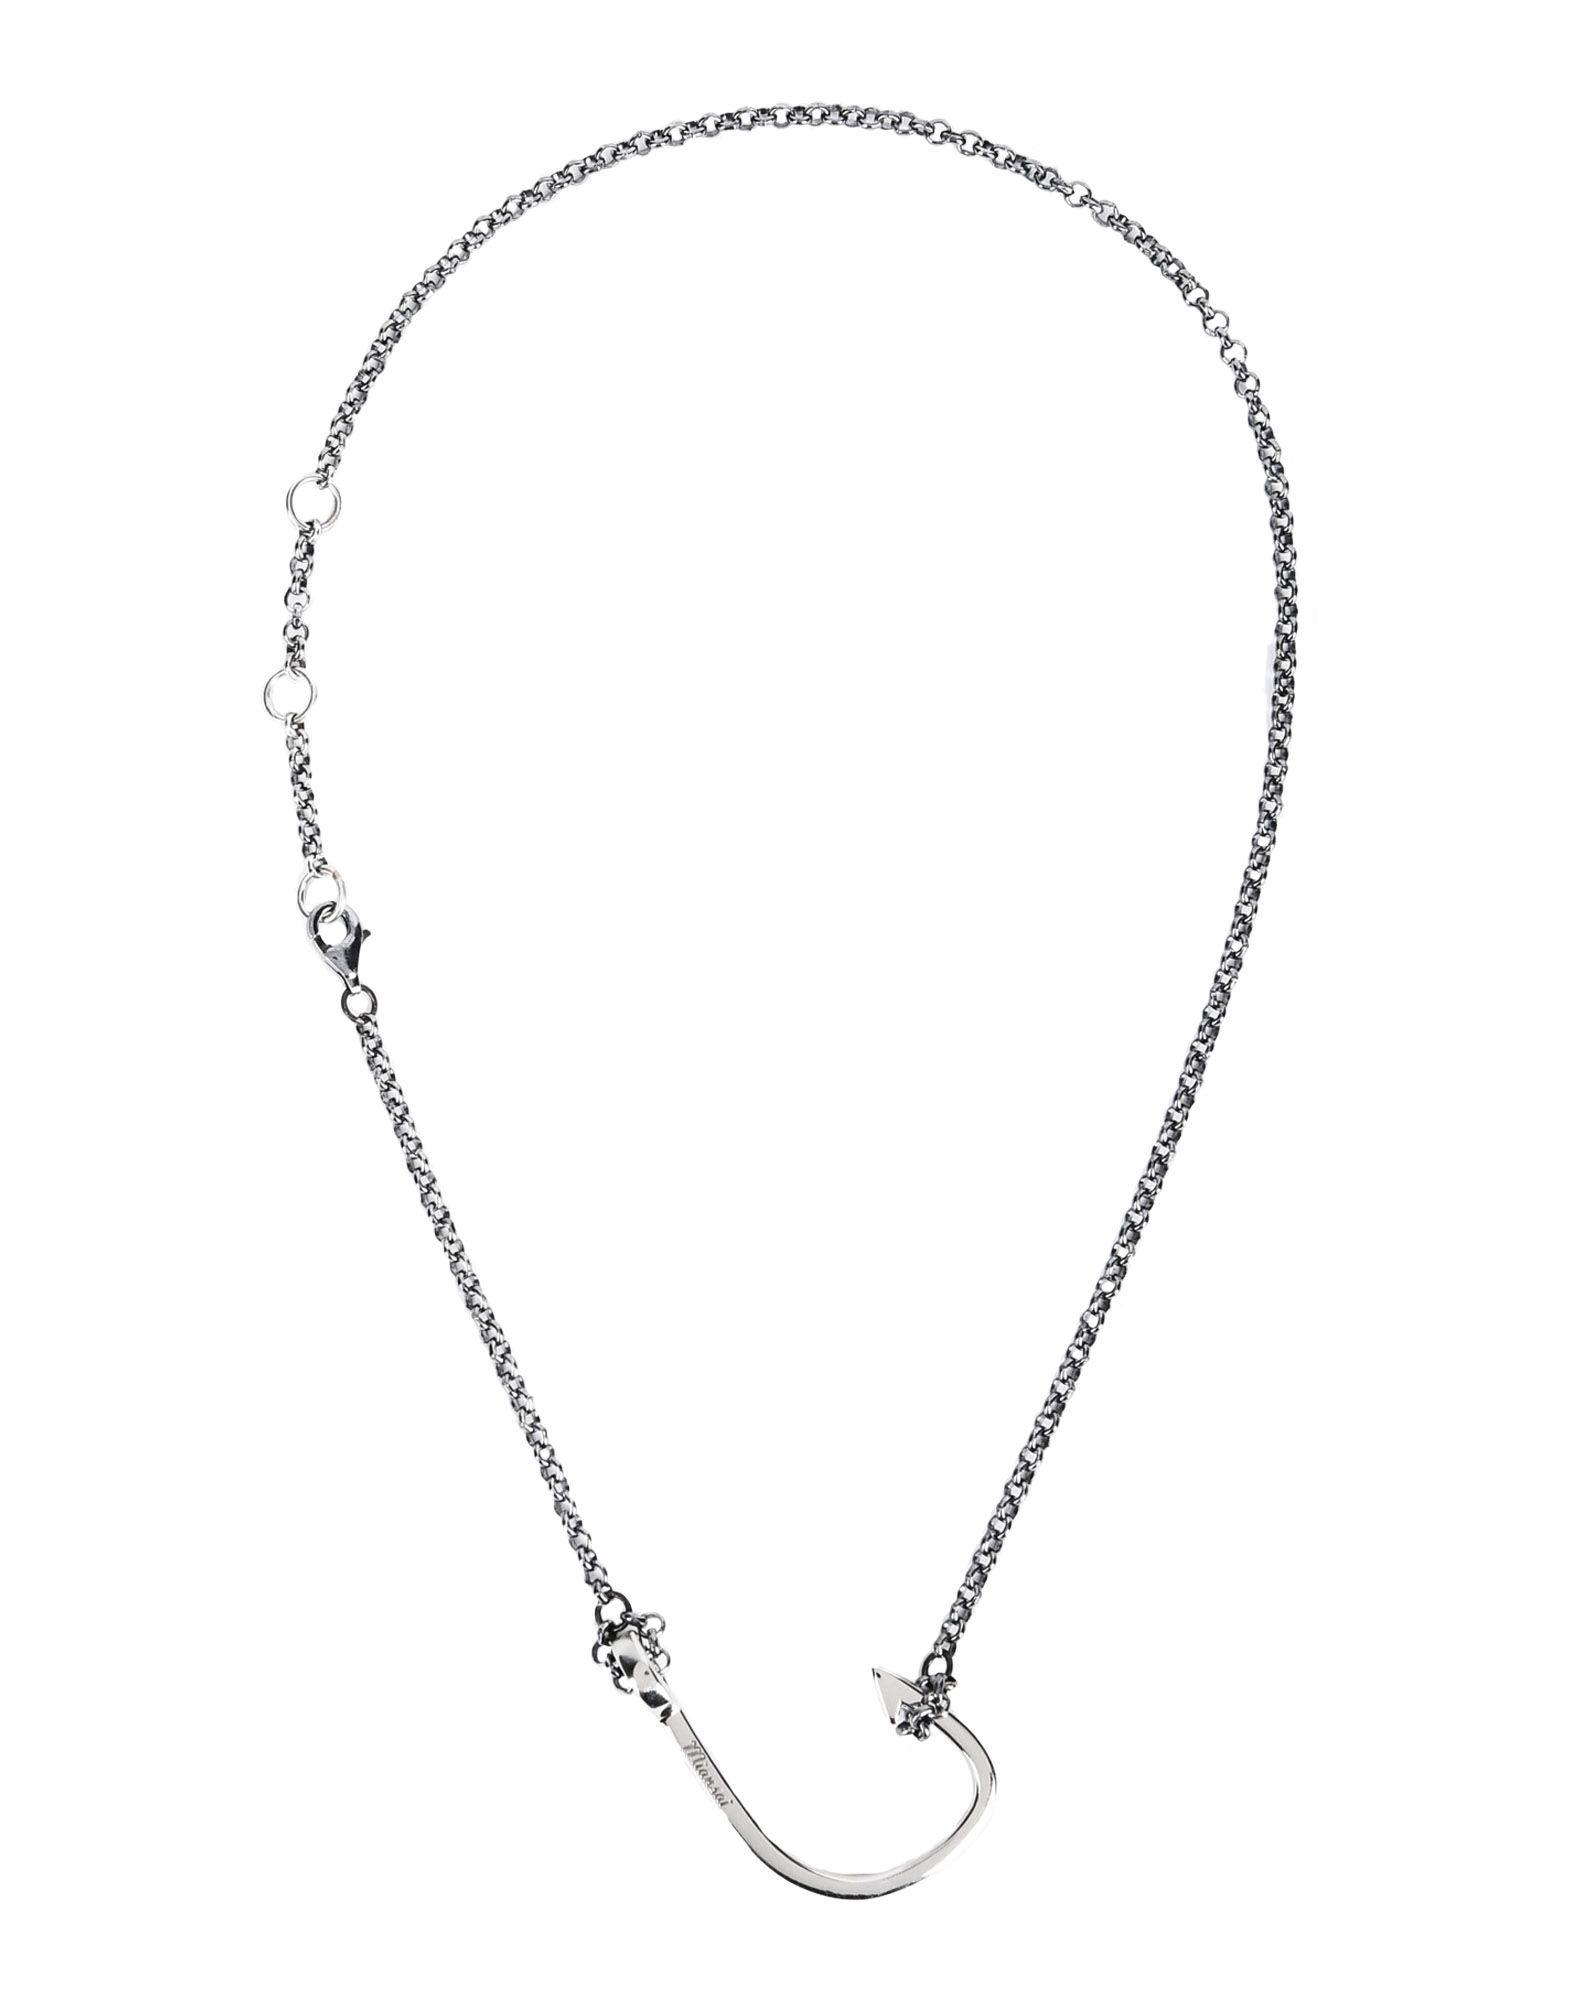 Collana Miansai Hook On Chain Bracelet - Uomo - Acquista online su